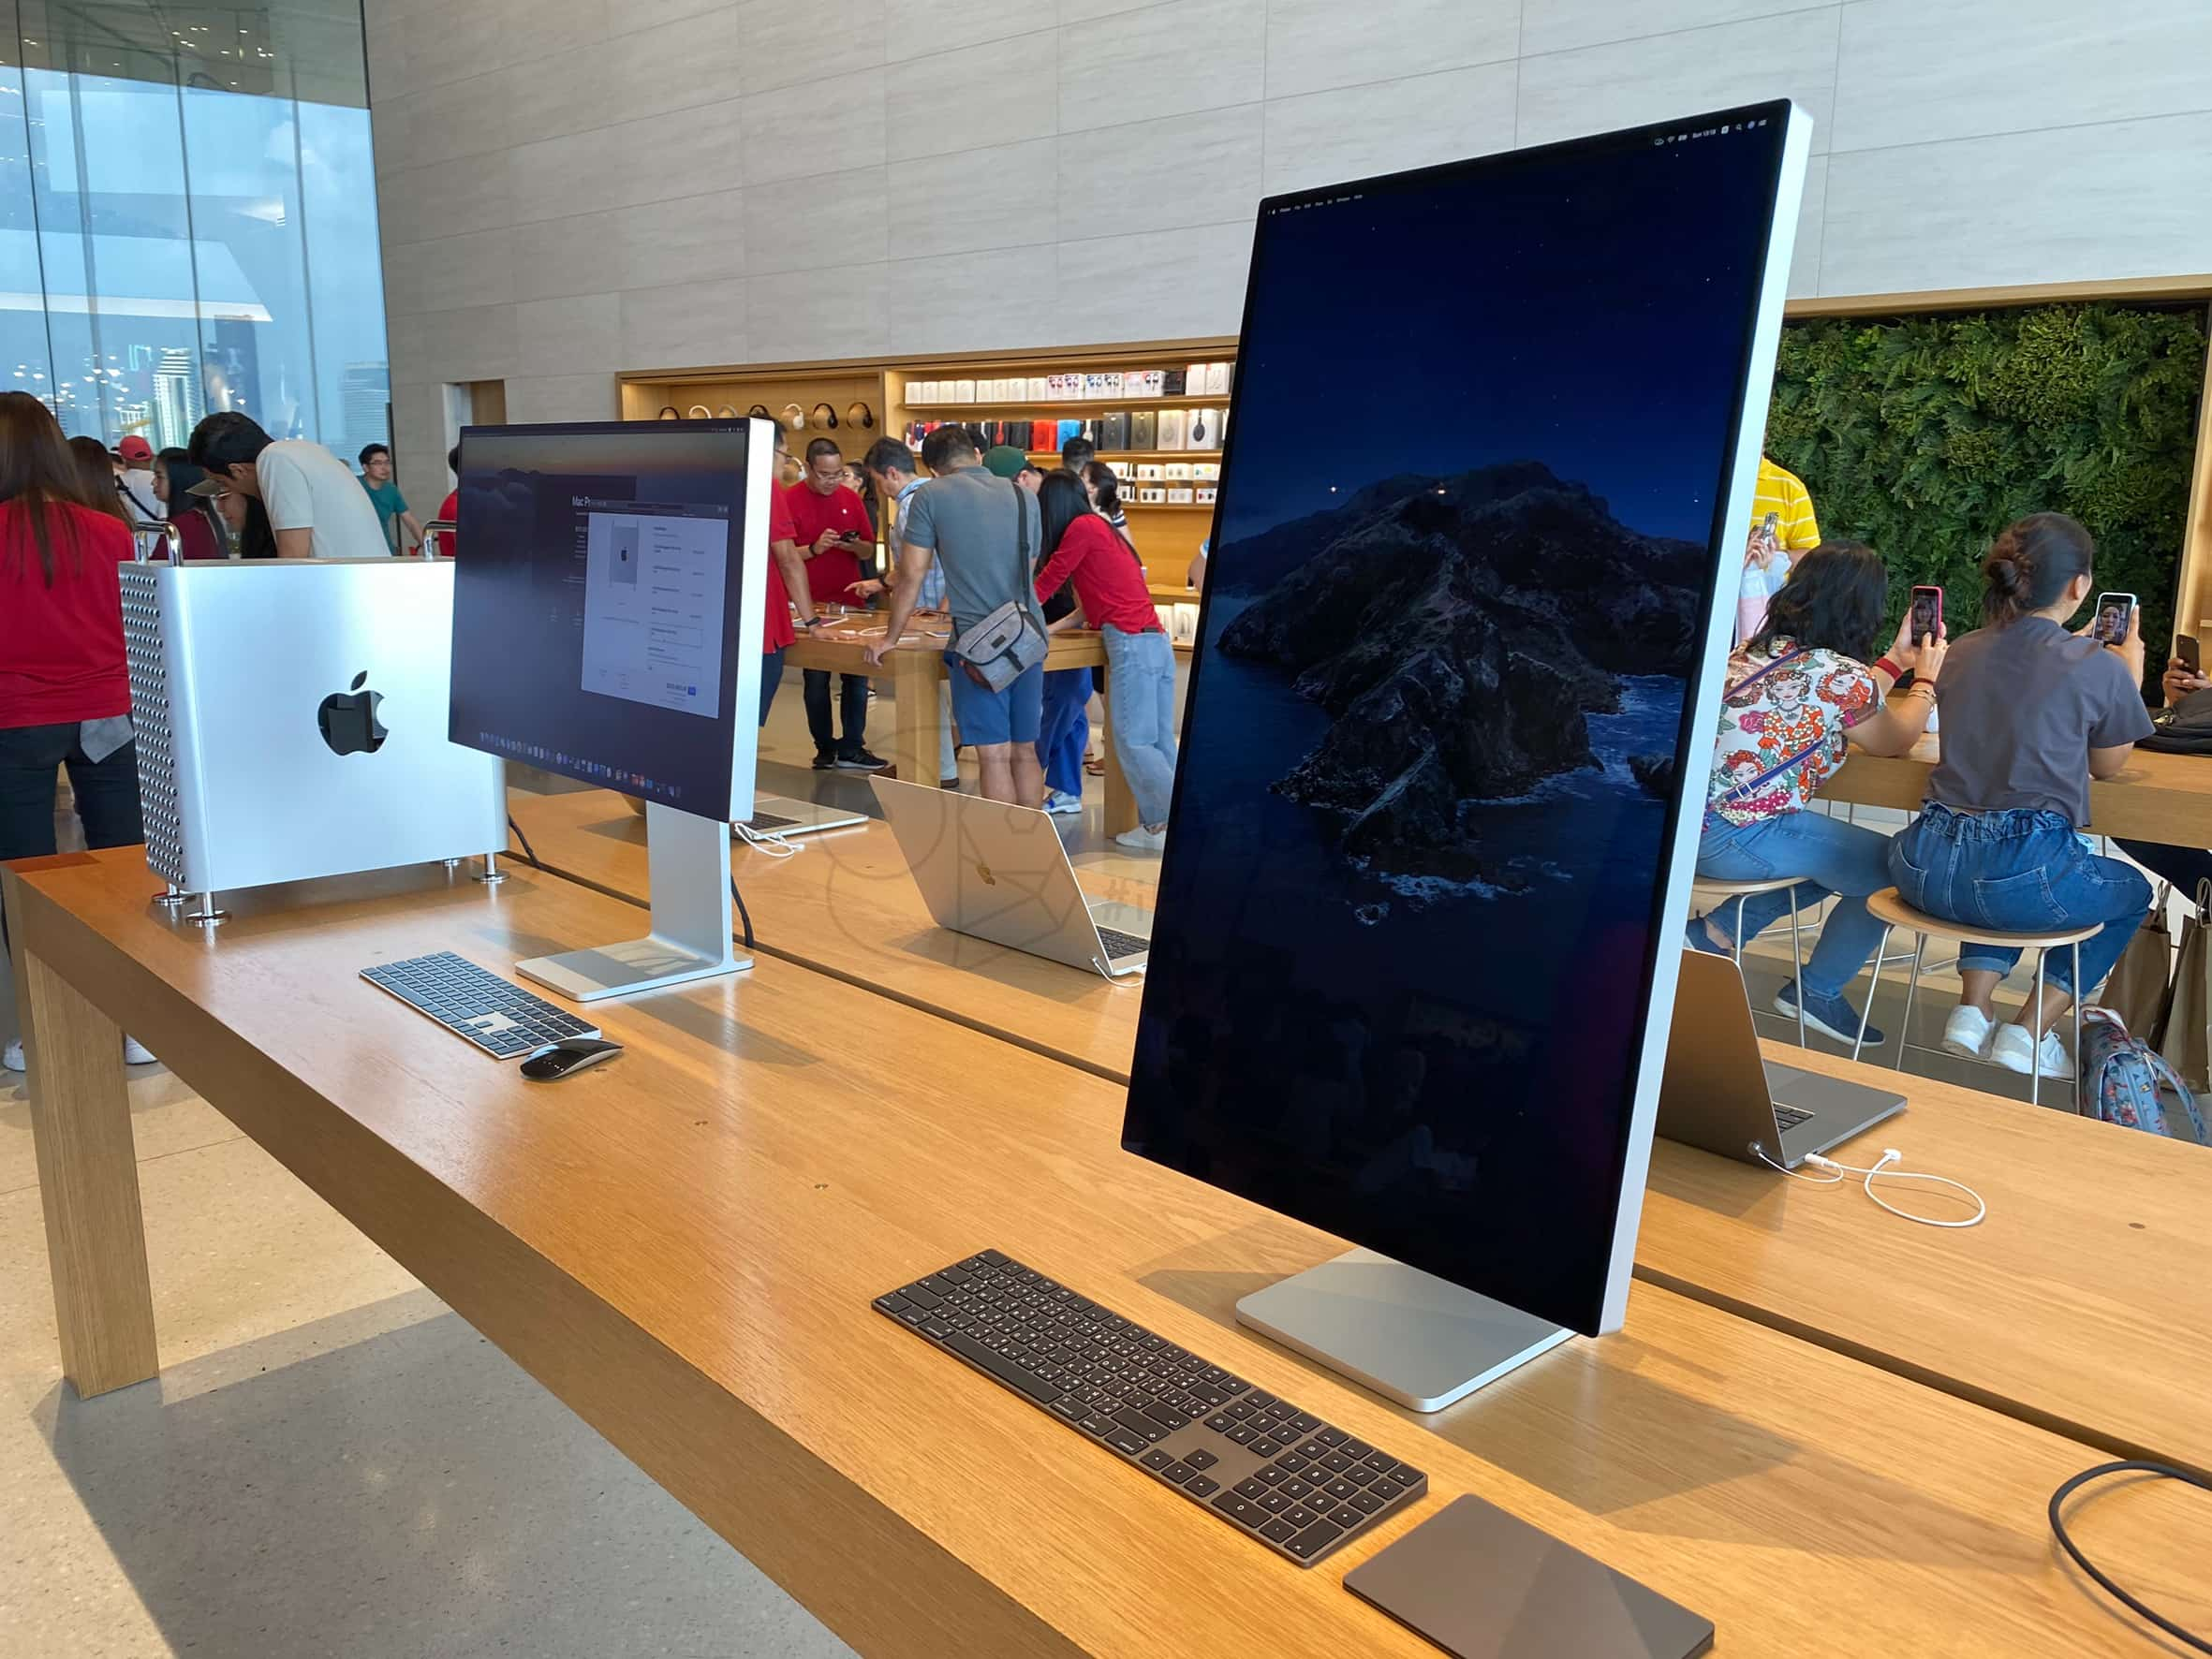 Mac Pro 2019 Pro Display Xdr Apple Iconsiam Img 1